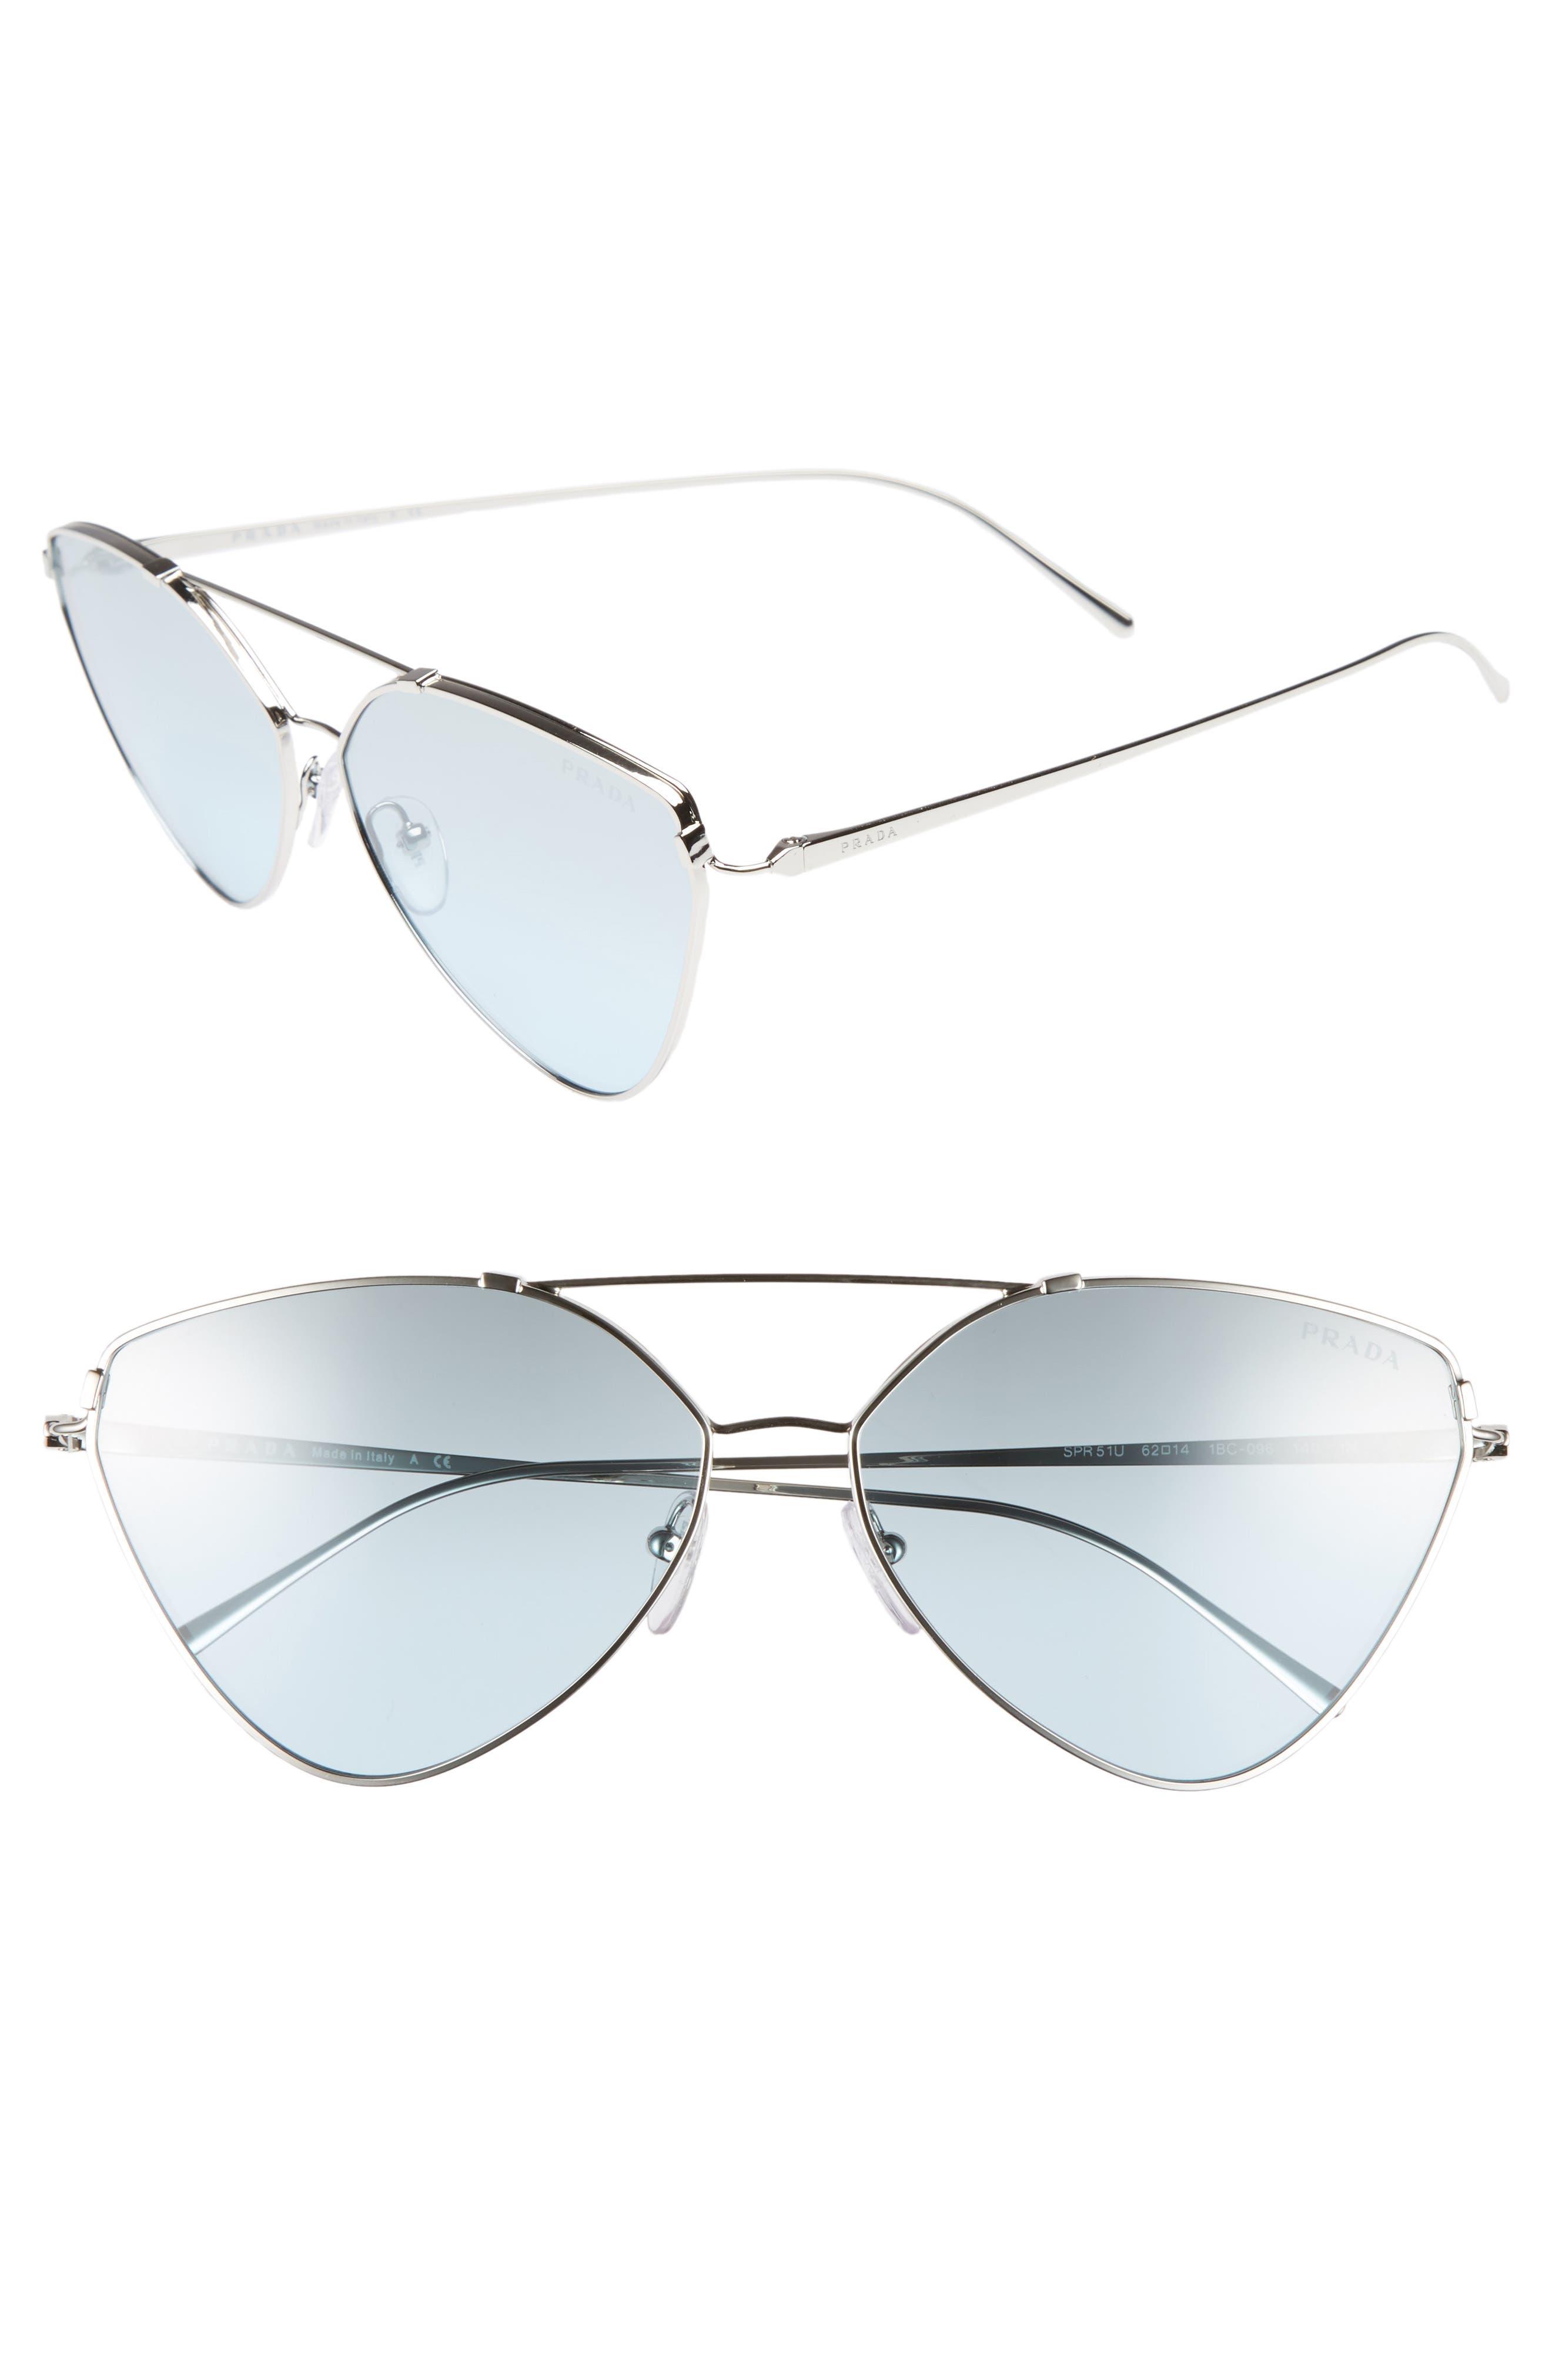 62mm Oversize Aviator Sunglasses,                         Main,                         color,